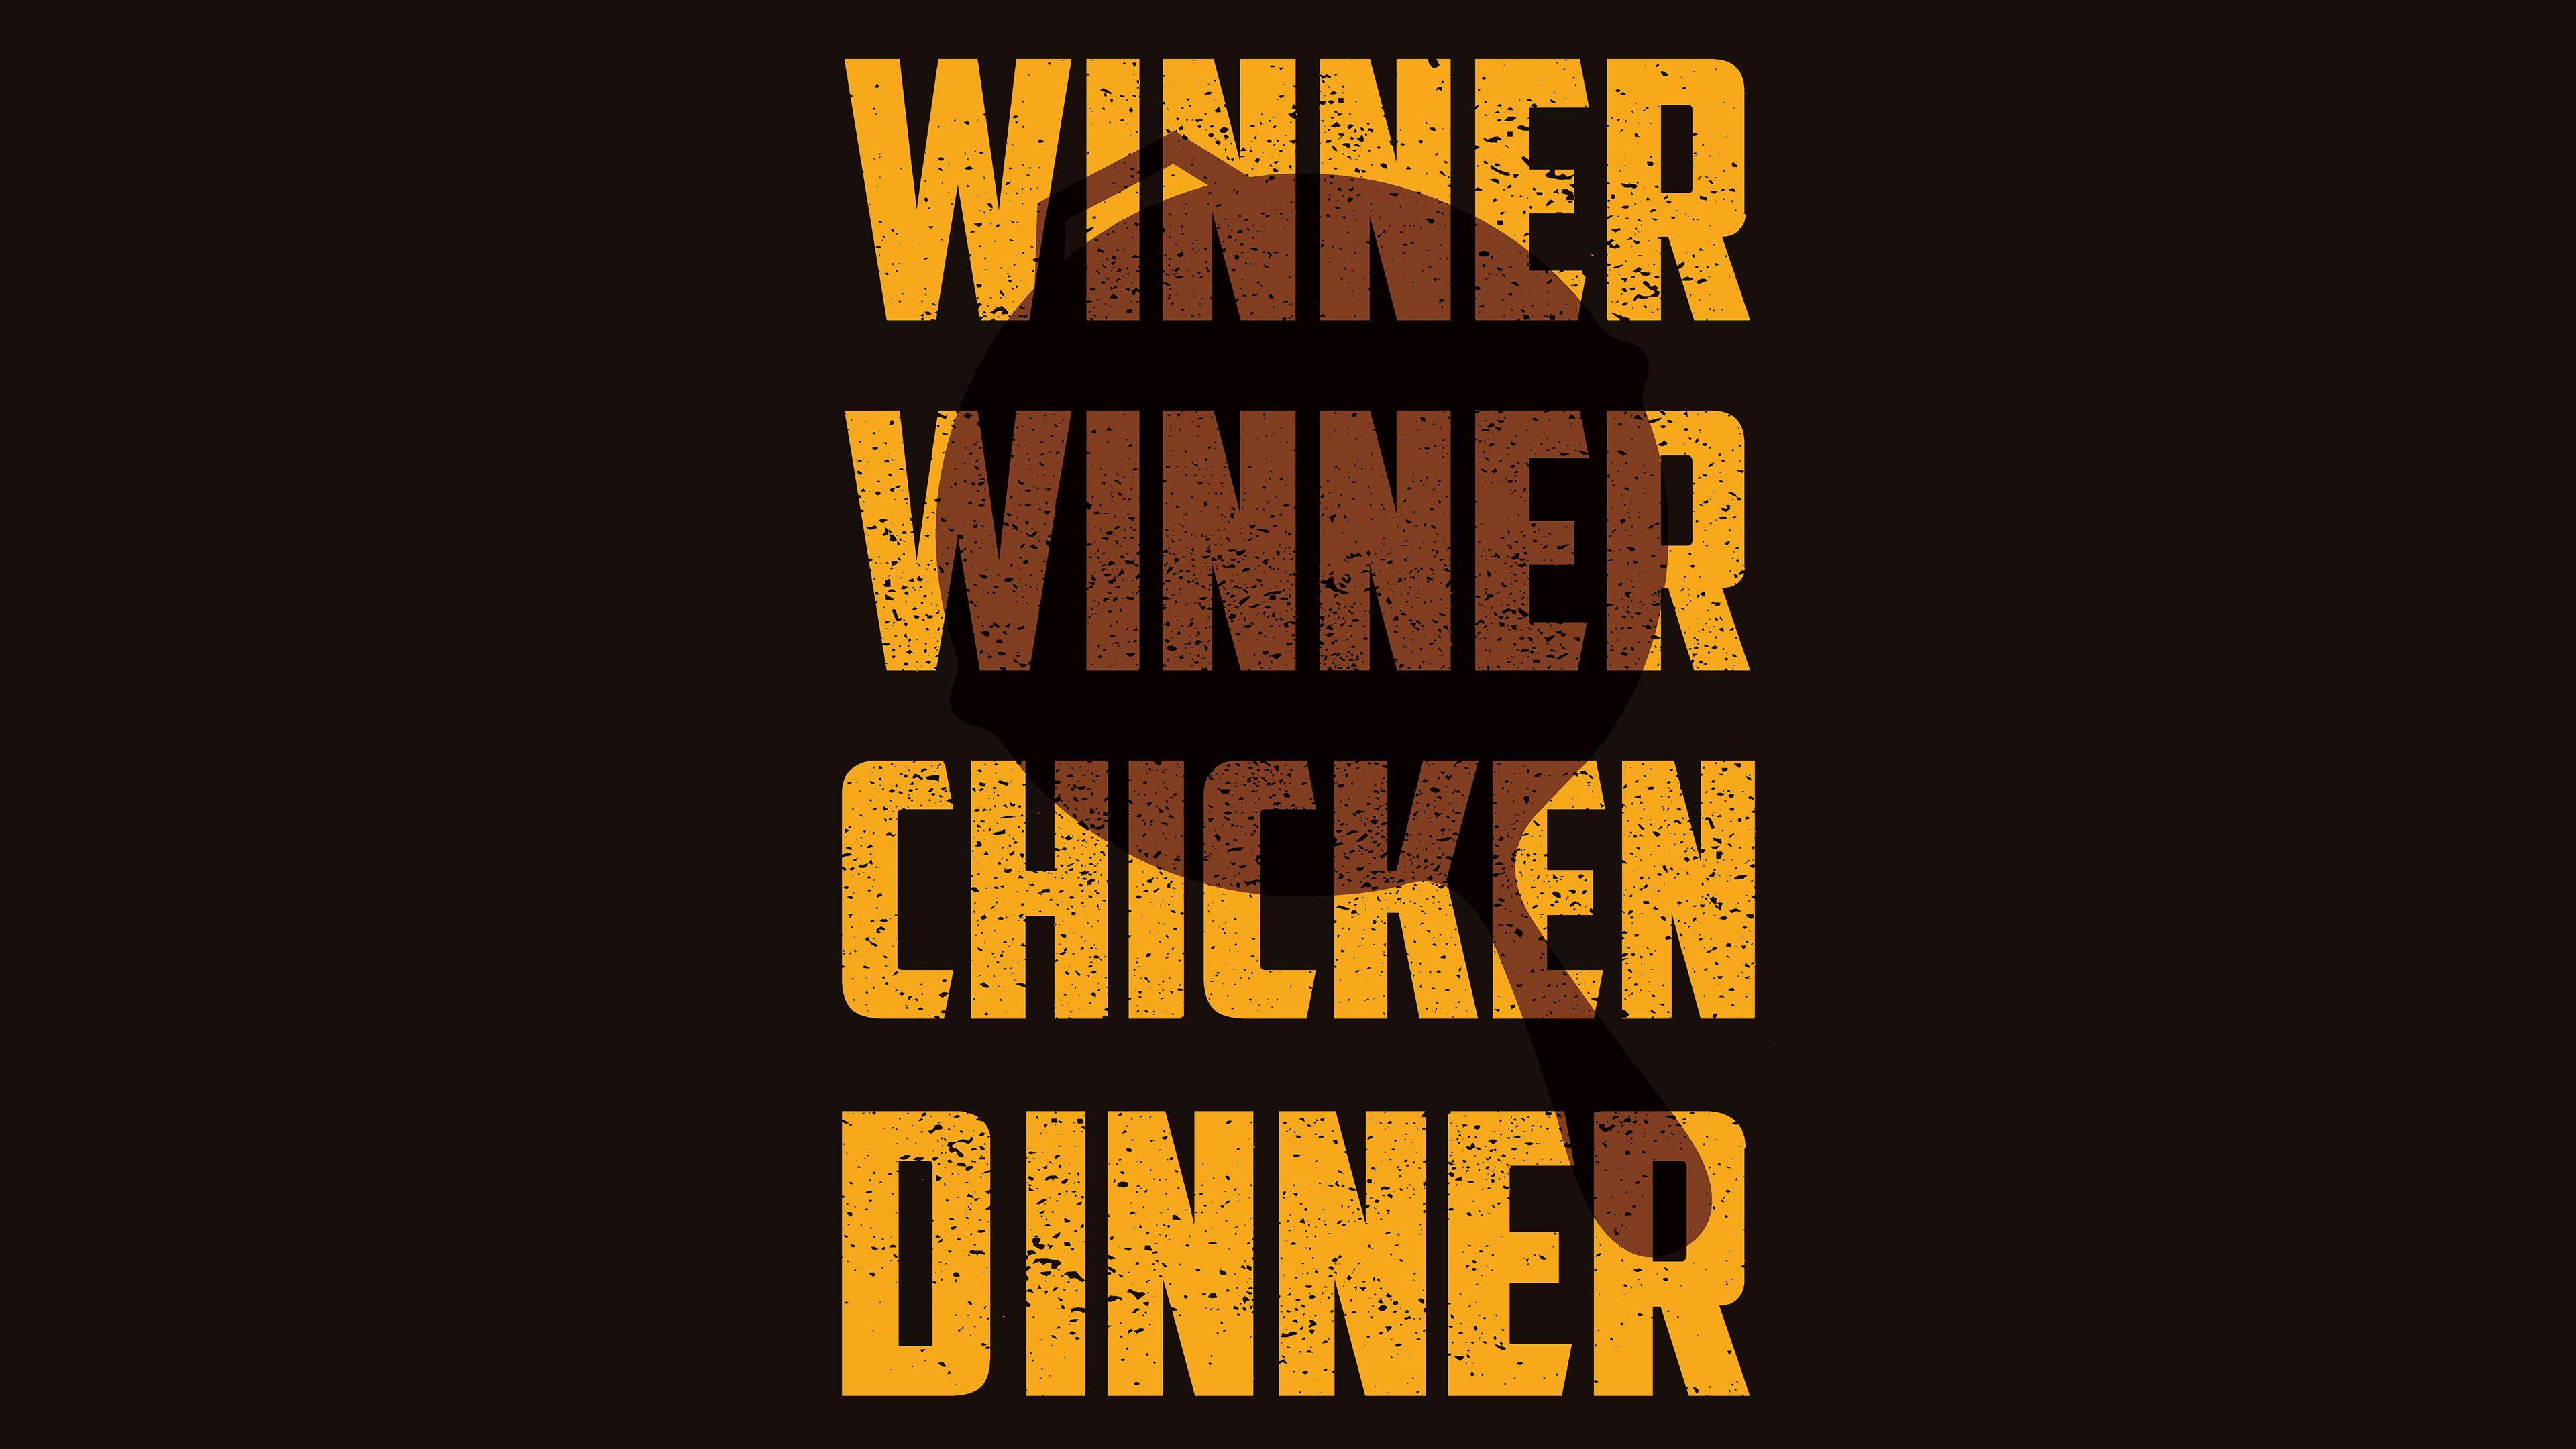 Winner Winner Chicken Dinner 4k Typography Wallpapers Pubg Wallpapers Playerunknowns Battleg Typography Wallpaper Winner Winner Chicken Dinner Chicken Dinner